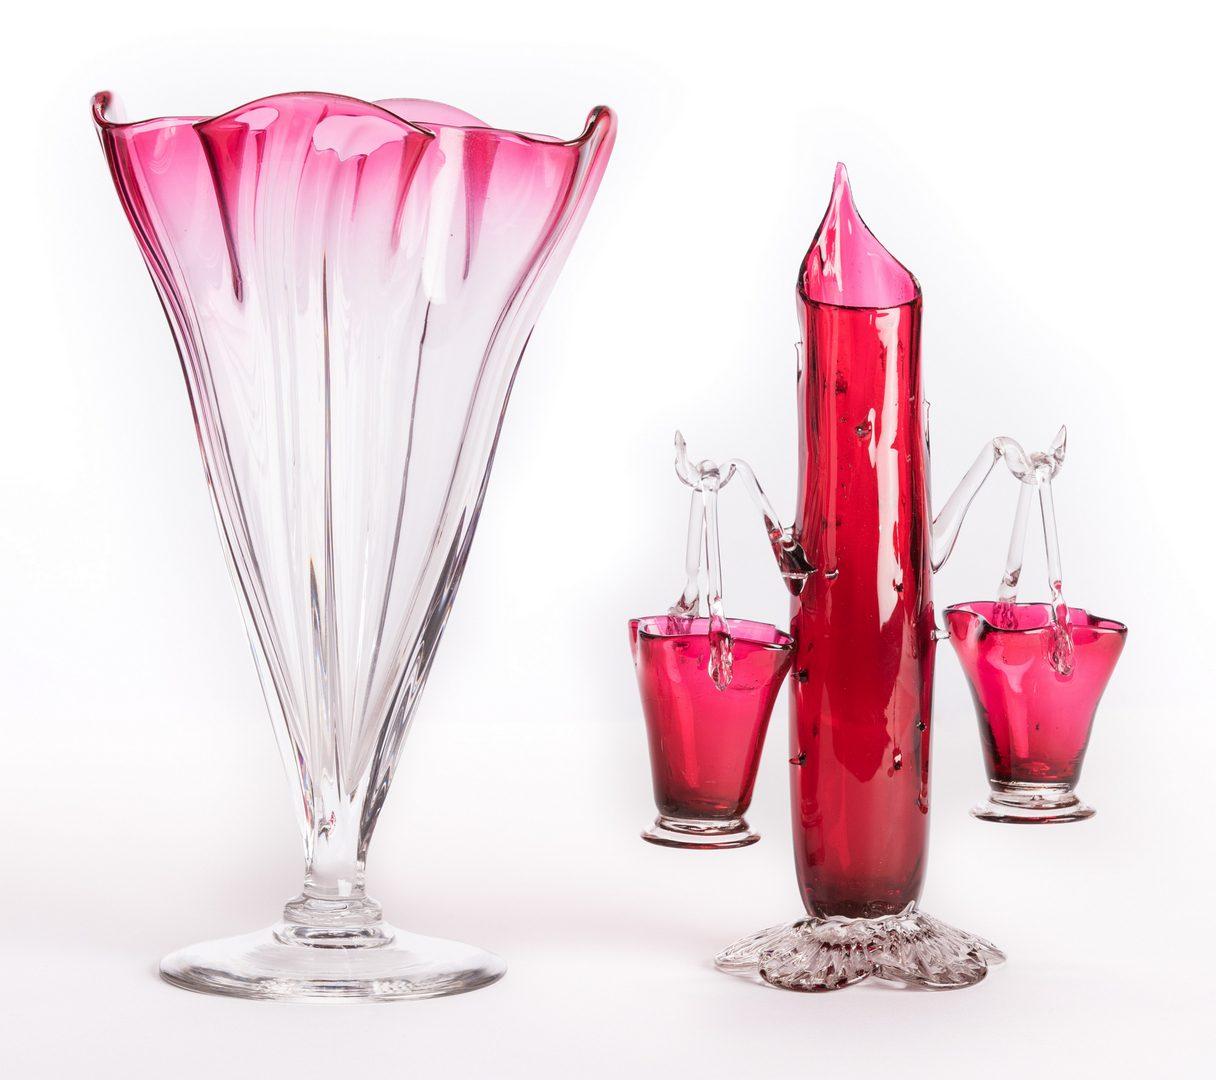 Lot 15: Steuben Grotesque Vase w/ Thorn Branch Form Vase w/ Baskets